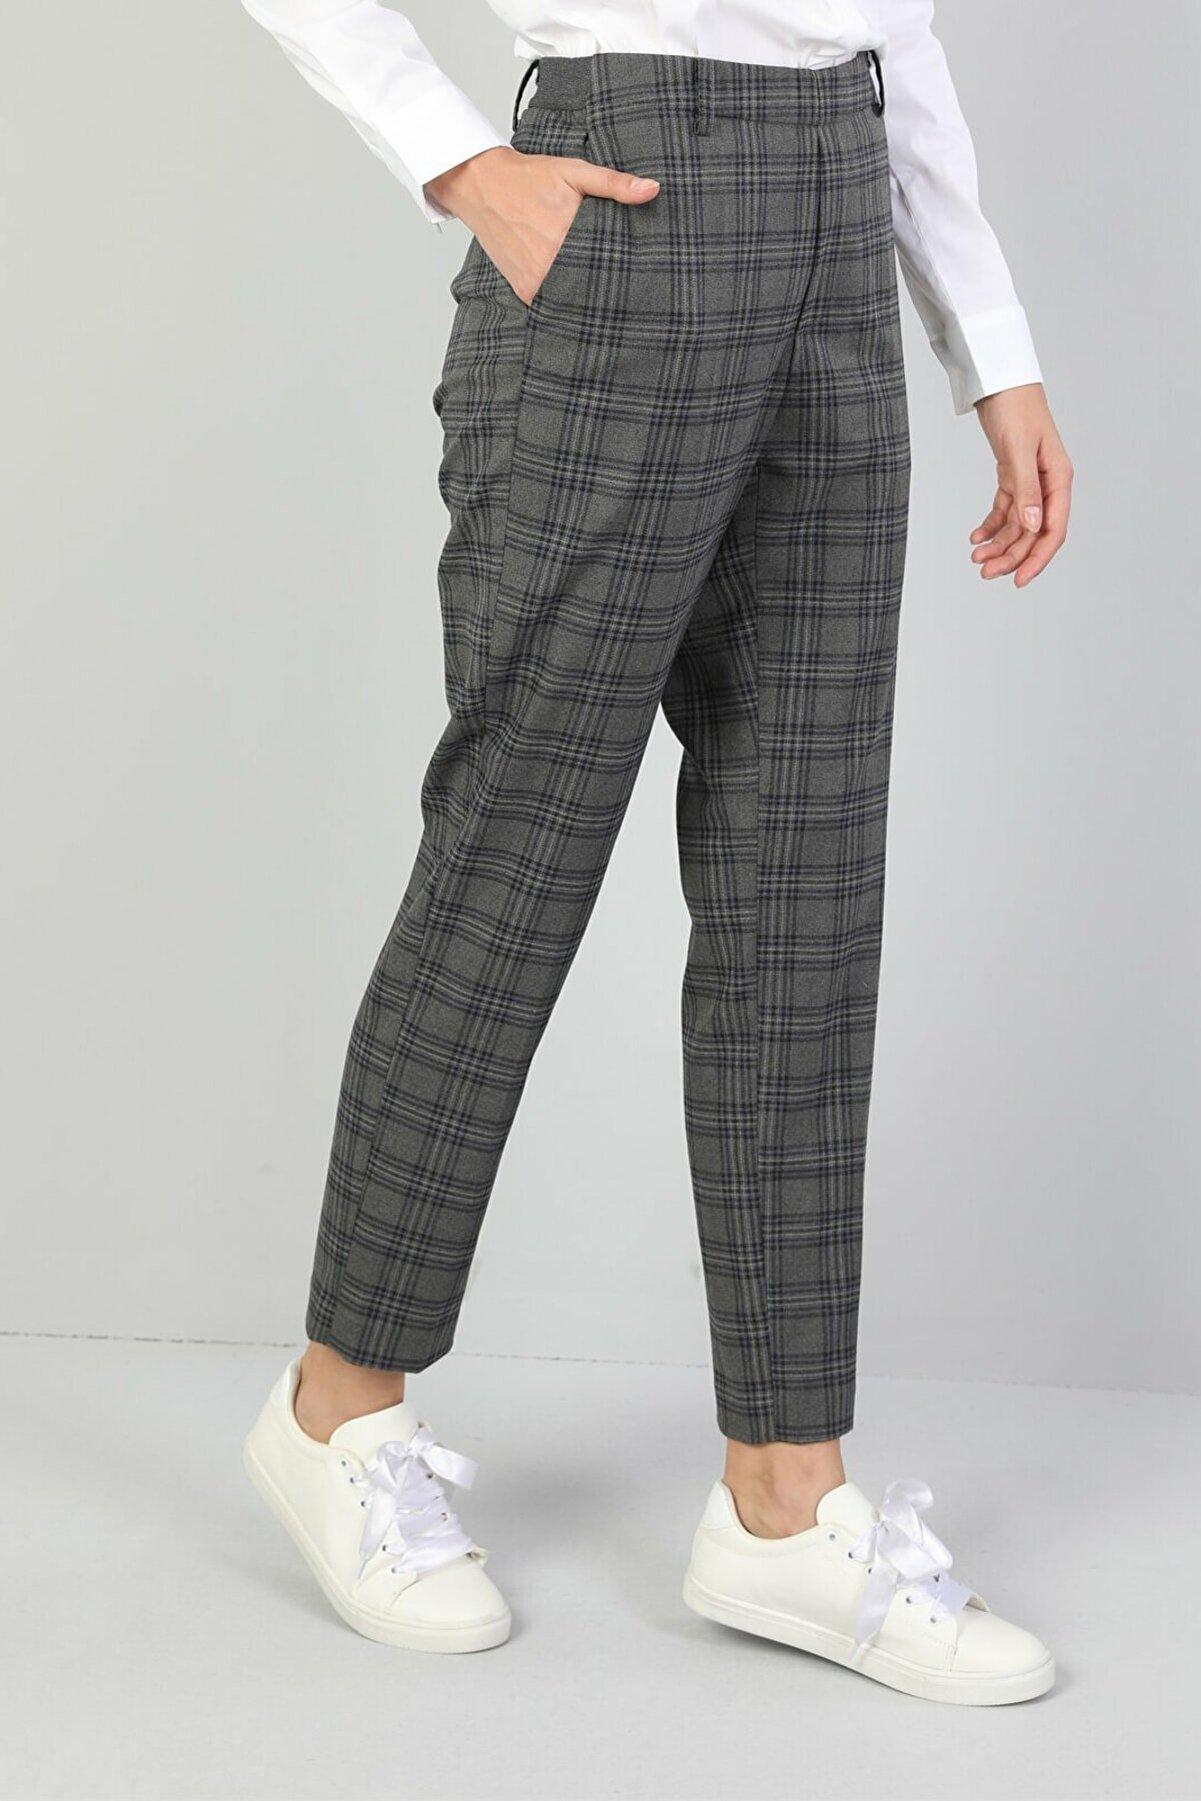 Colin's KADIN Slim Fit Düşük Bel Düz Paça Kadın Koyu Gri Pantolon CL1044965